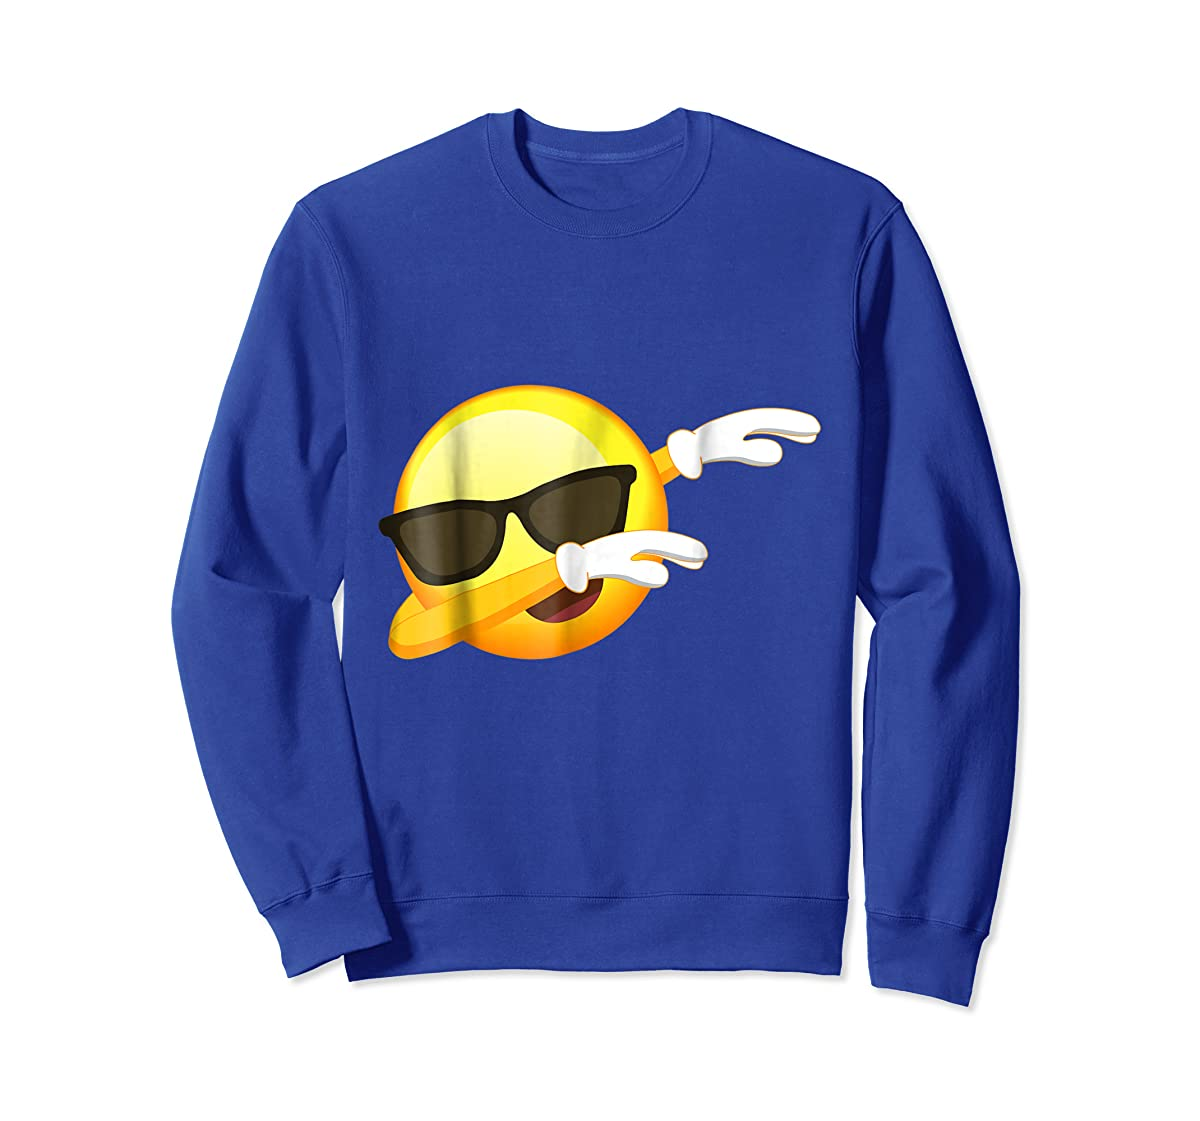 Funny Dabbing Emoji Shirt - Cool Emoji Dab T-Shirt-Sweatshirt-Royal